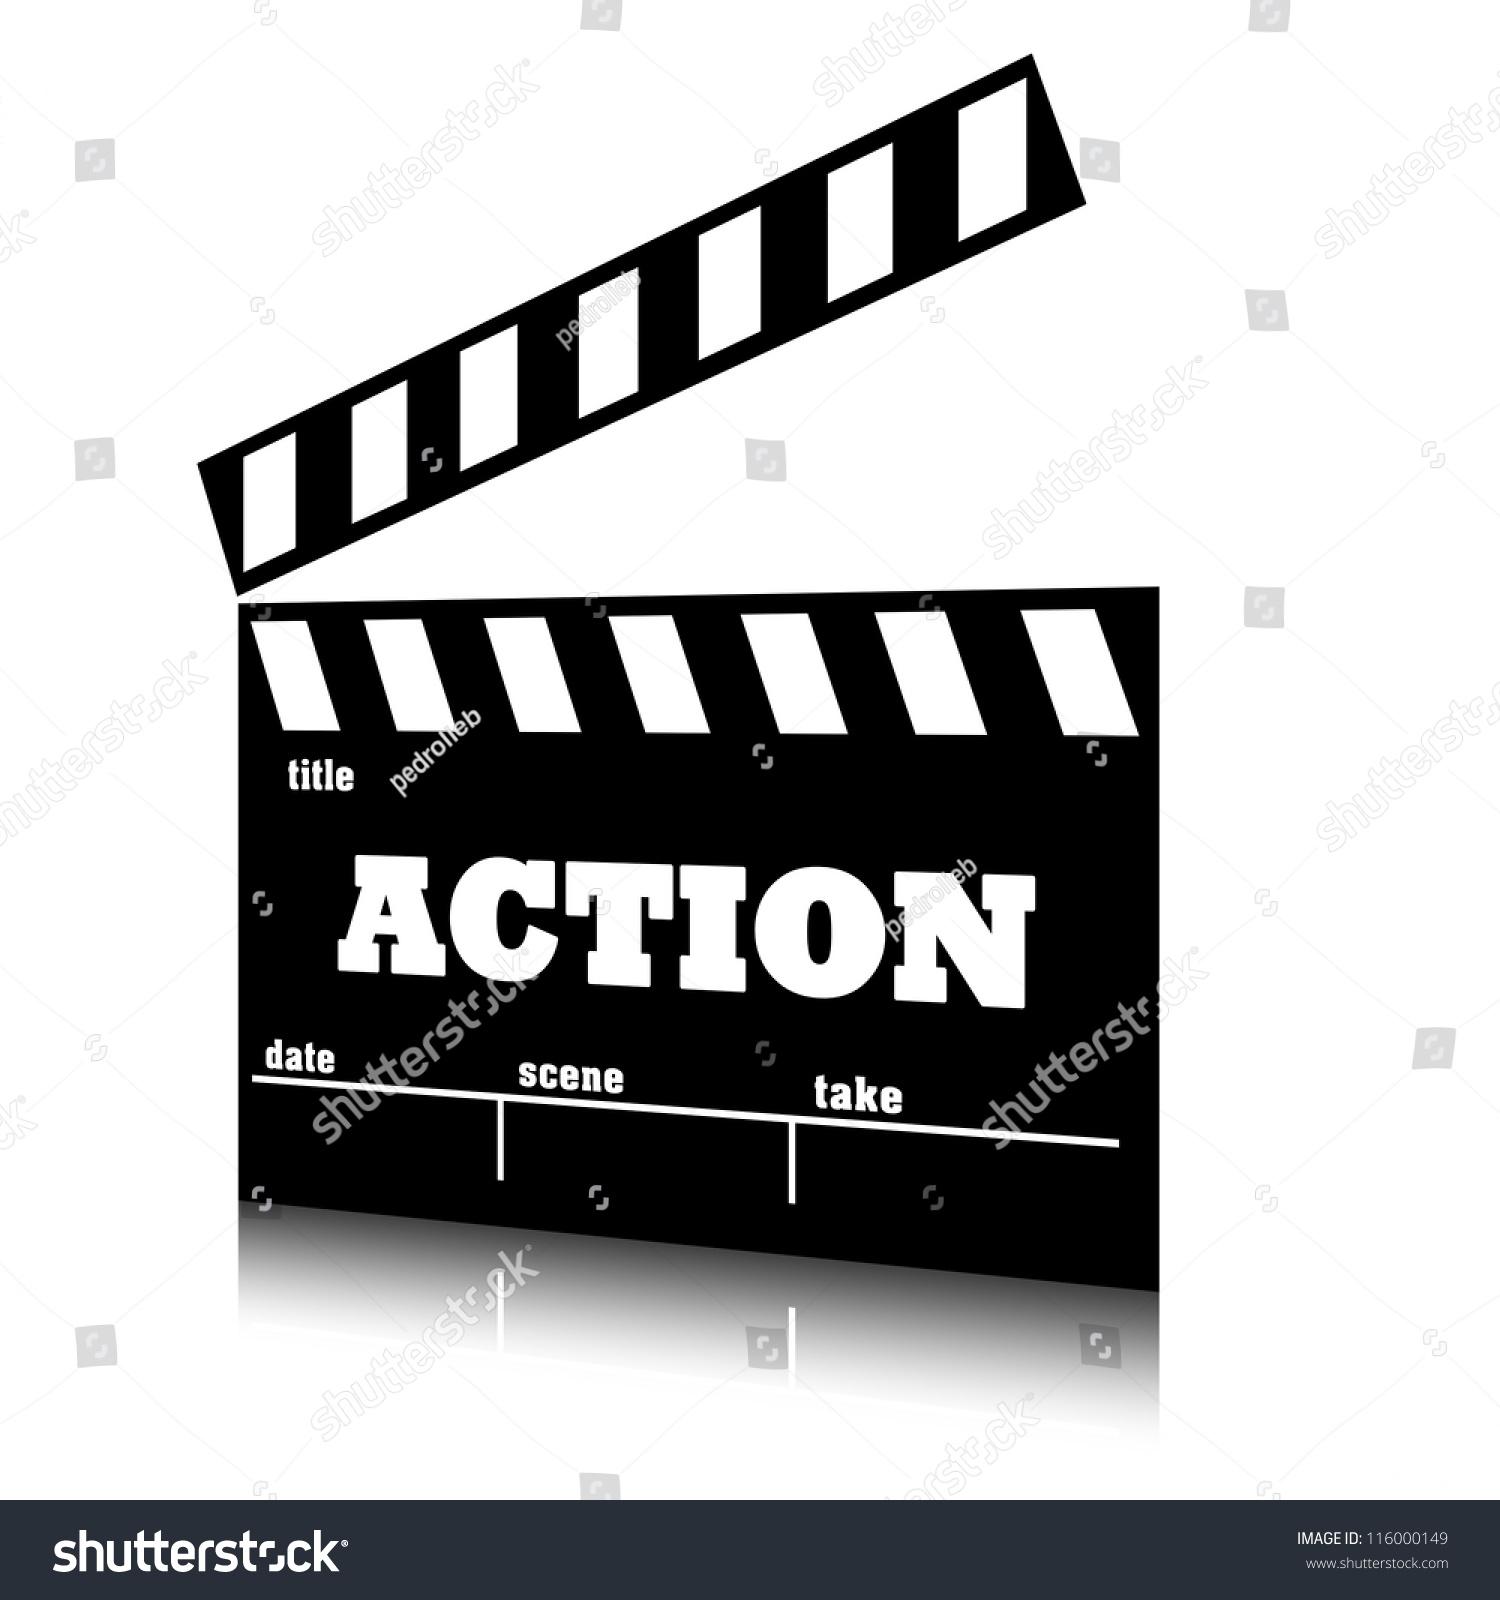 clap film cinema action genre clapperboard stock illustration